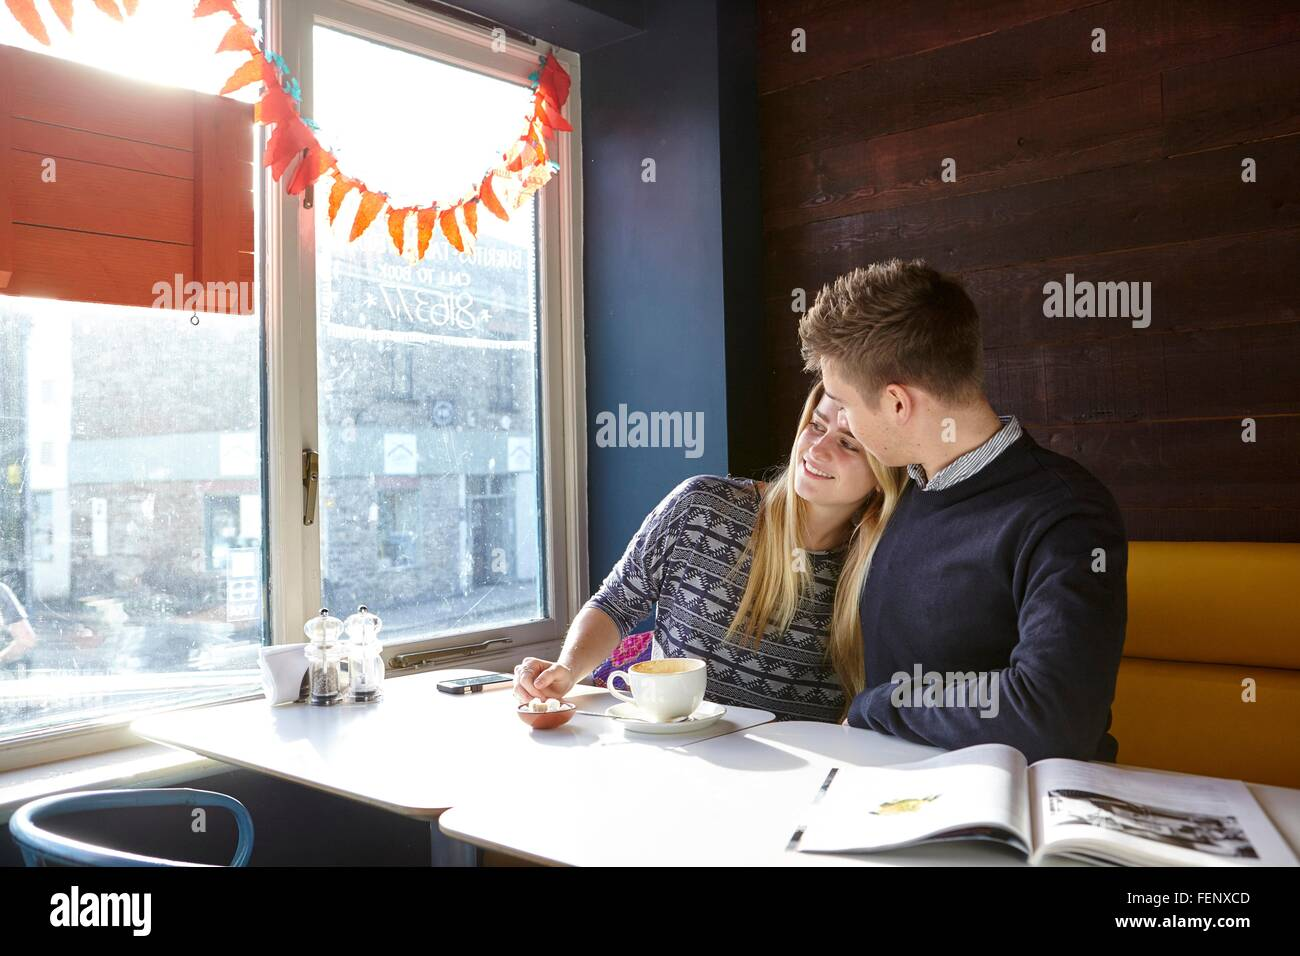 Romantische junges Paar am Tag im Café Fensterplatz Stockbild